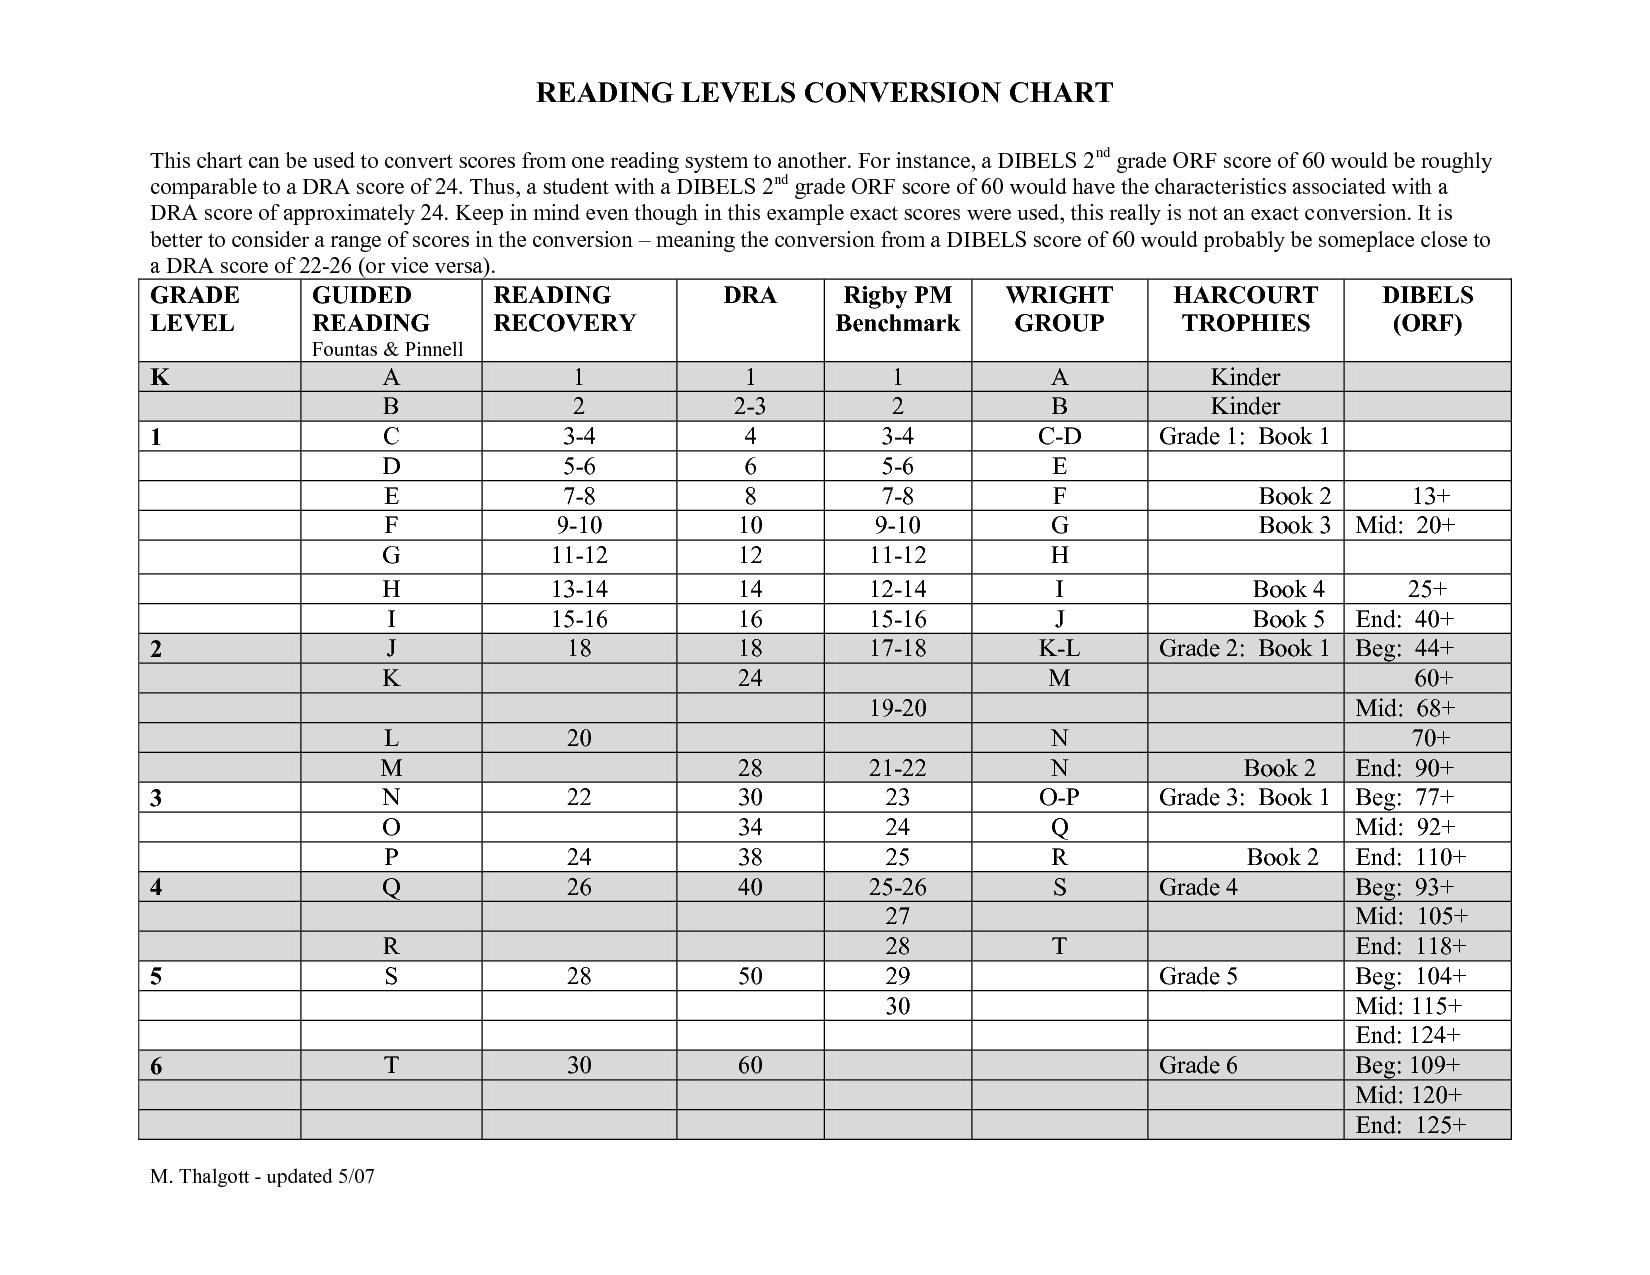 Dibbles conversion chart fabulous first grade finds pinterest dibbles conversion chart school resourcesguided readingassessmentchartformative assessment geenschuldenfo Images